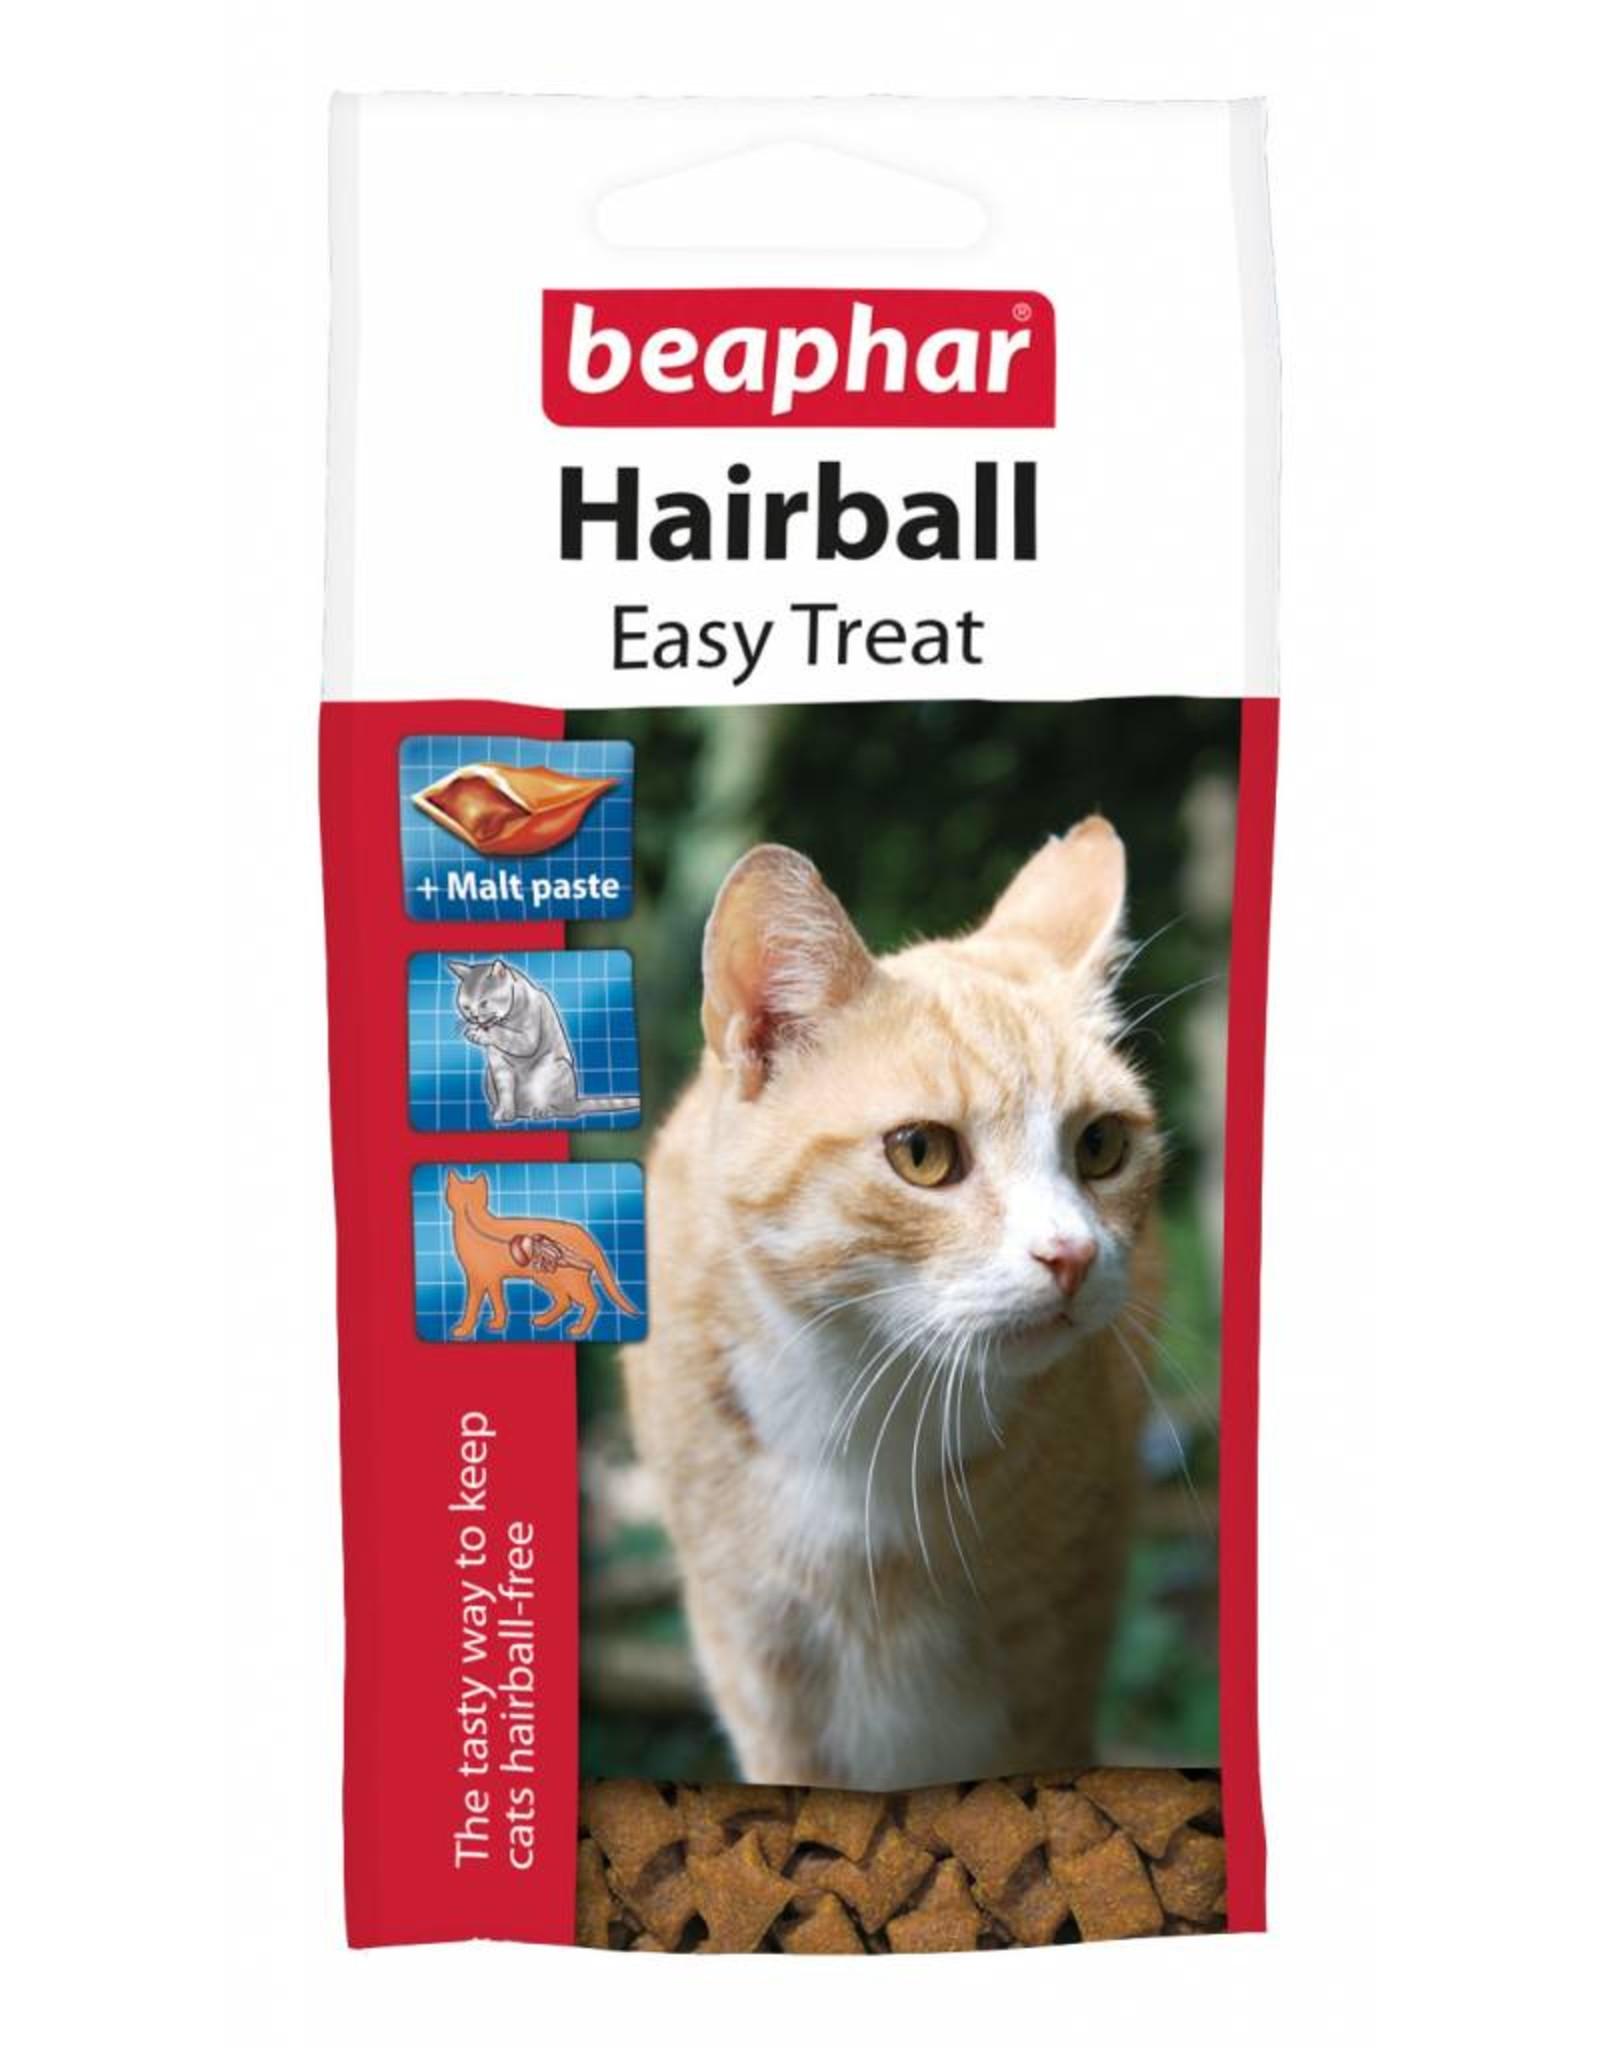 Beaphar Hairball Easy Cat Treats, 35g